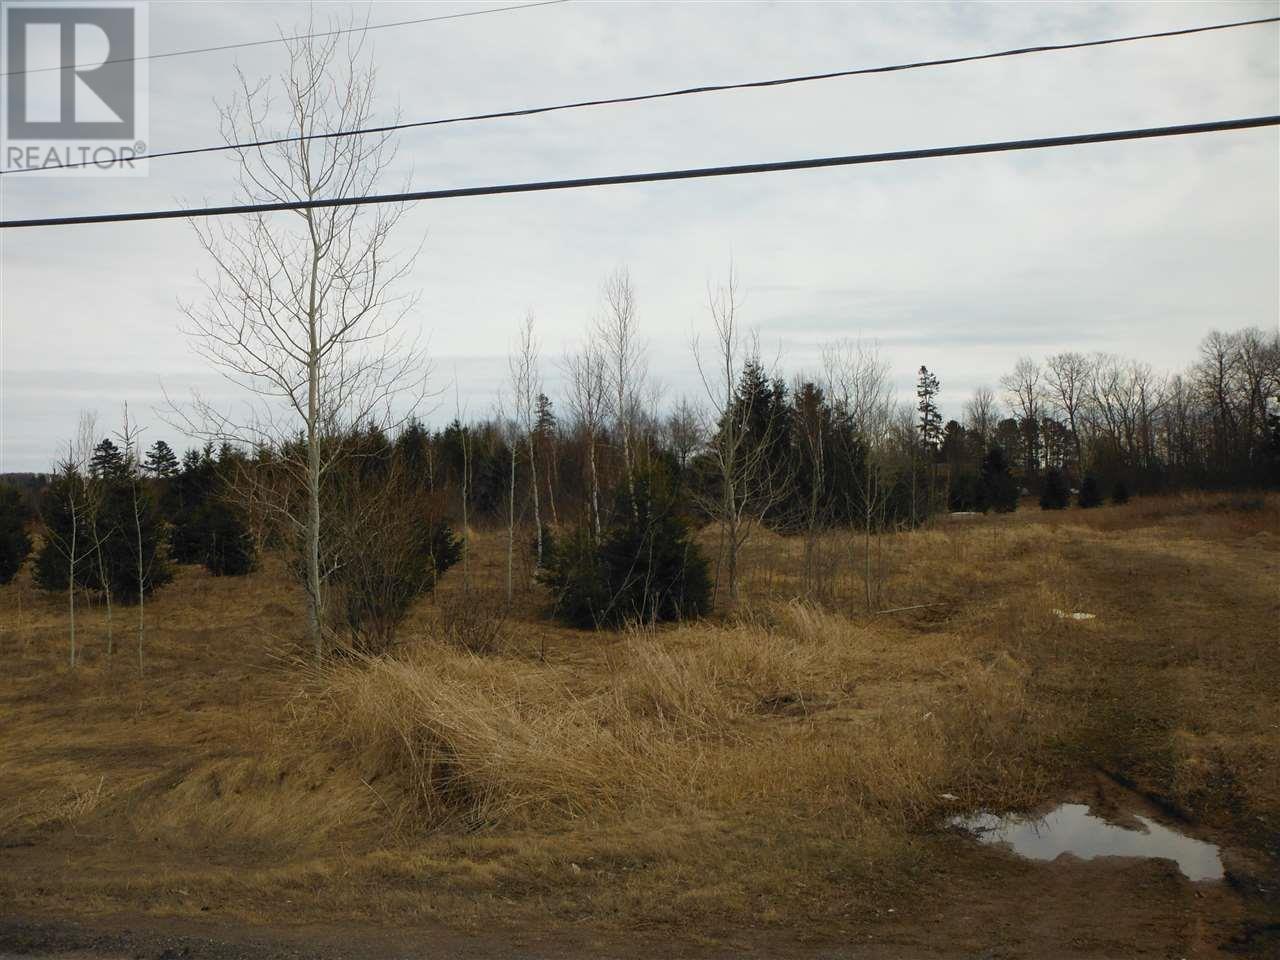 Lot 1-16 Royalty Junction RoadLot 1-16 Royalty Junction Road, Charlottetown, Prince Edward Island C1E1Z2, ,Vacant Land,For Sale,Lot 1-16 Royalty Junction Road,202006111